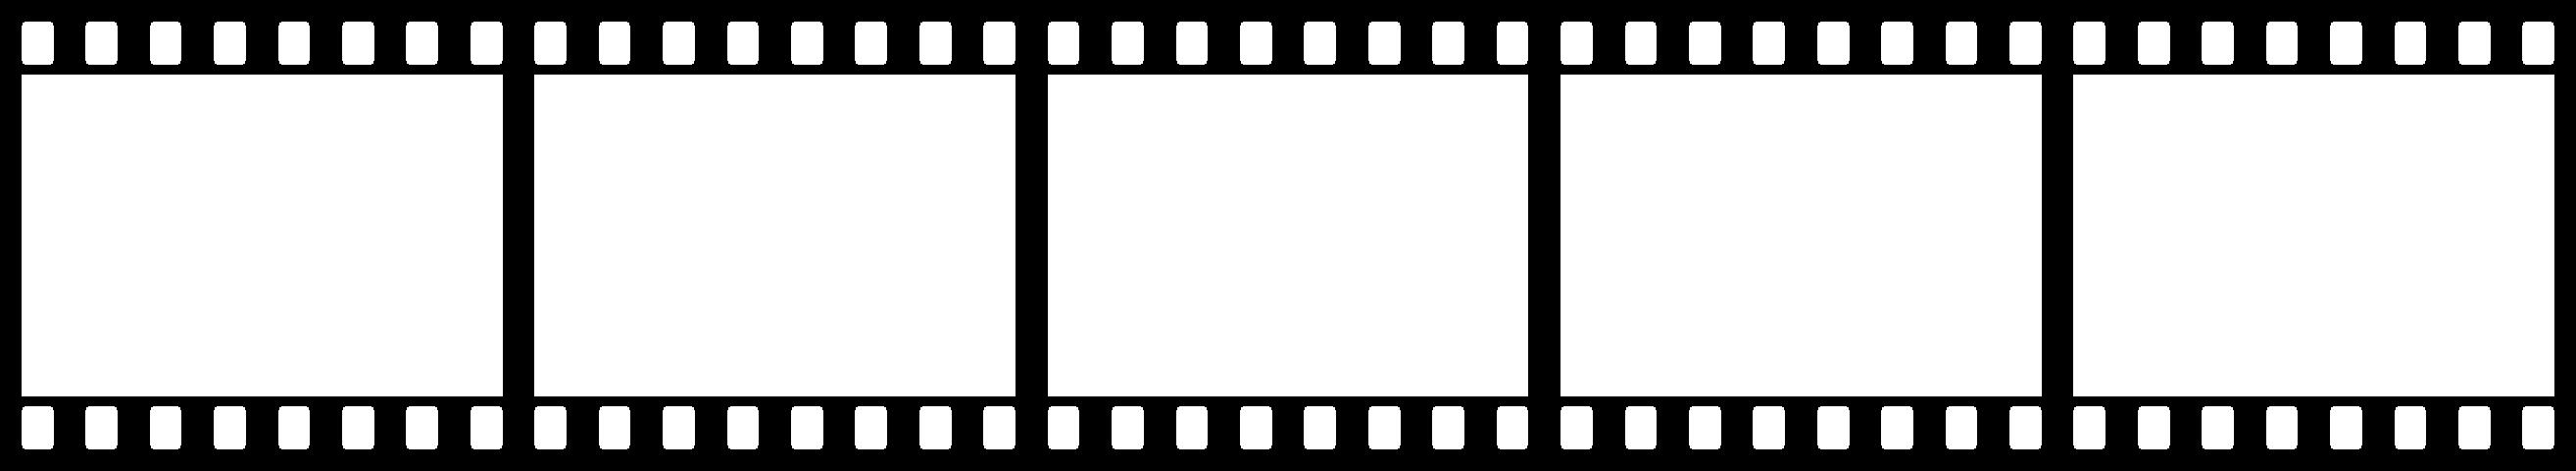 Free 35Mm Film Cliparts, Download Free Clip Art, Free Clip.